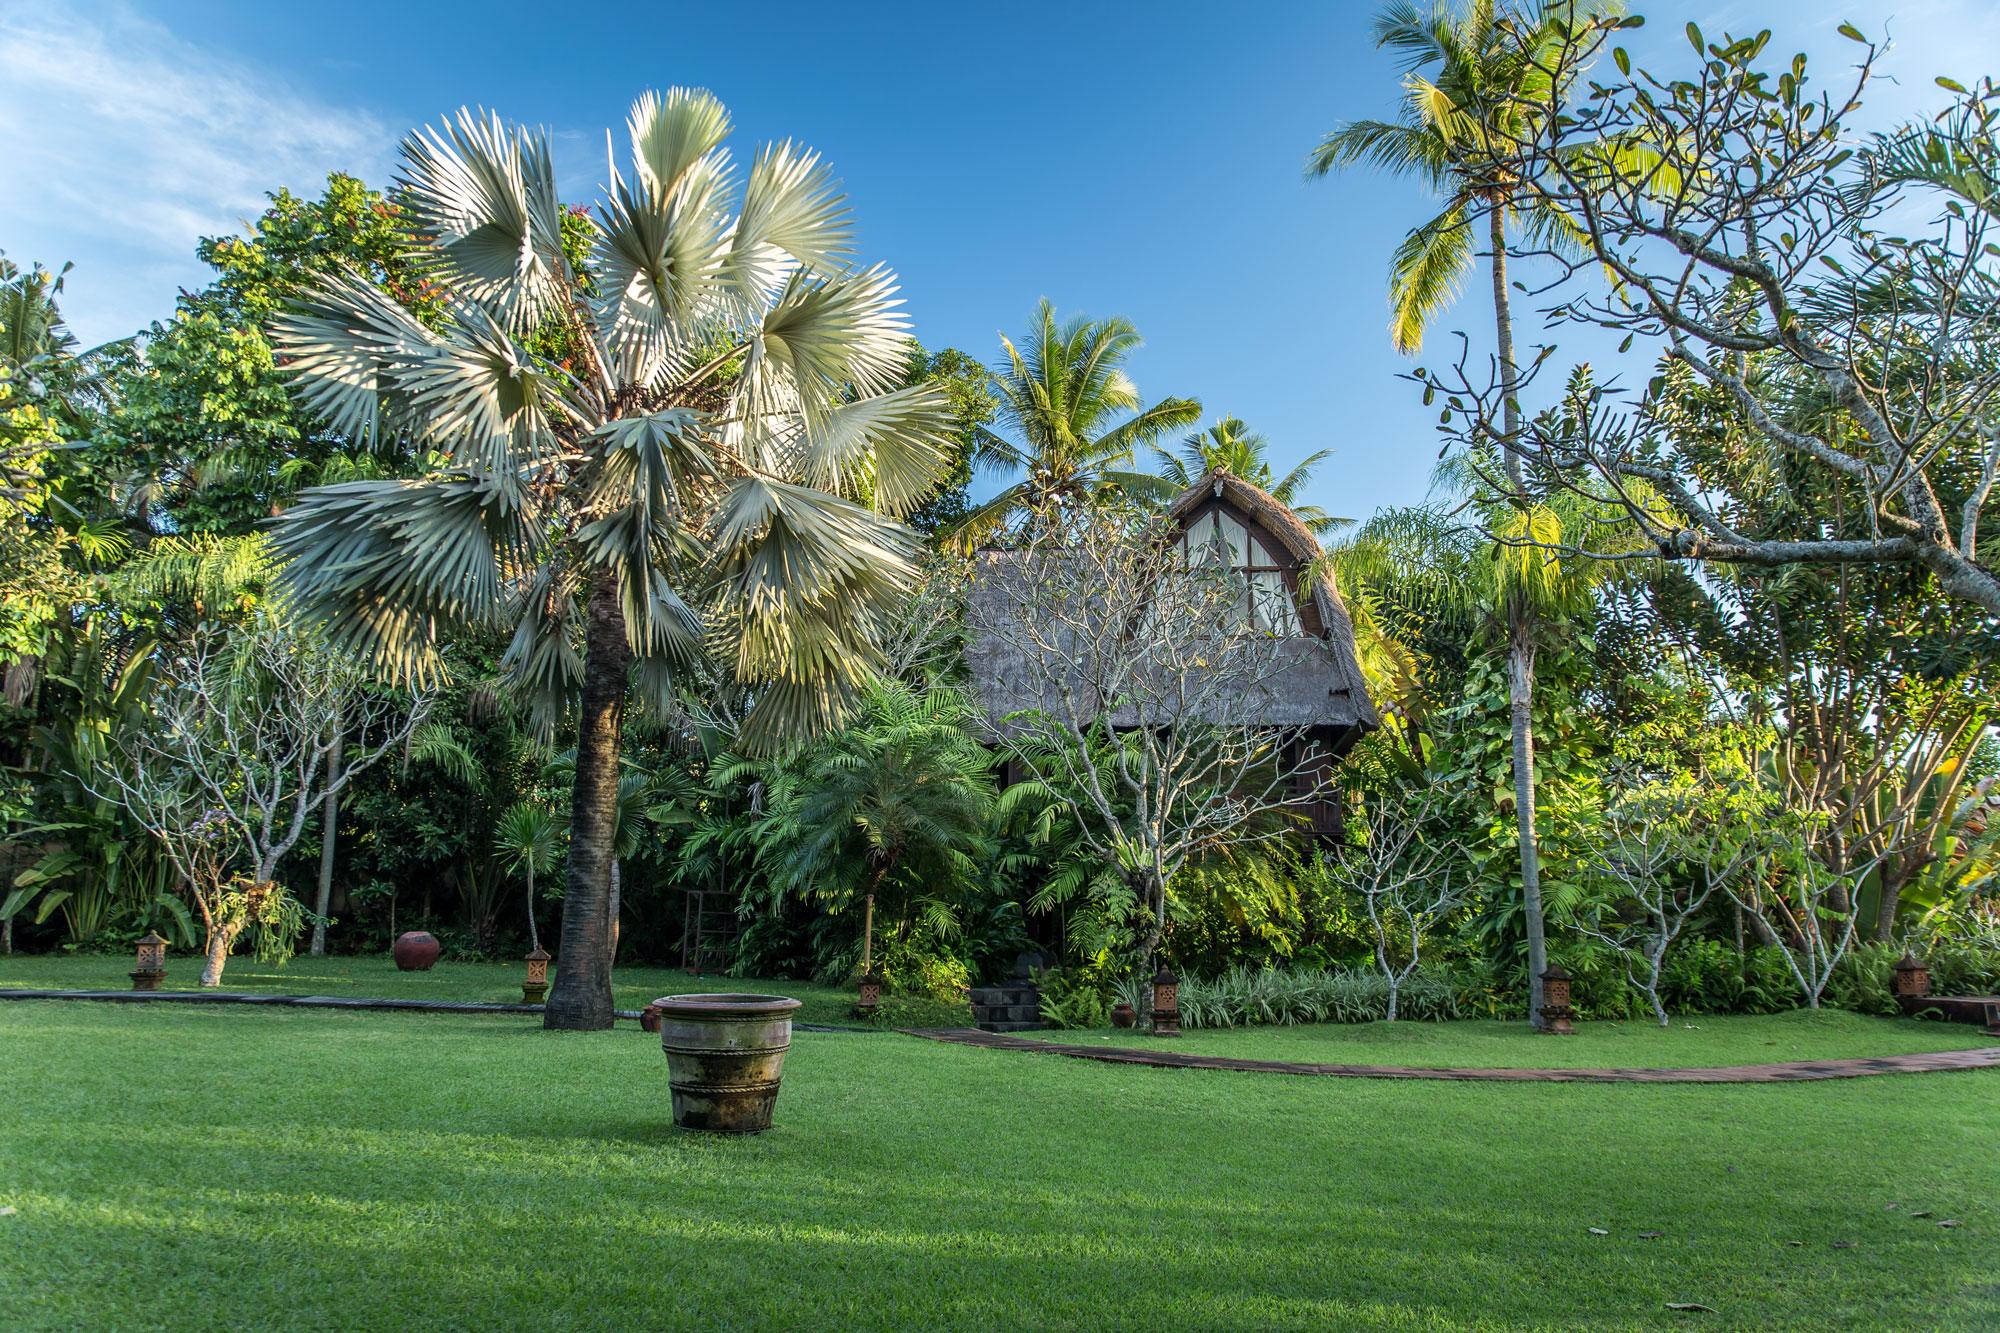 Bali-Purnati-1-15.jpg